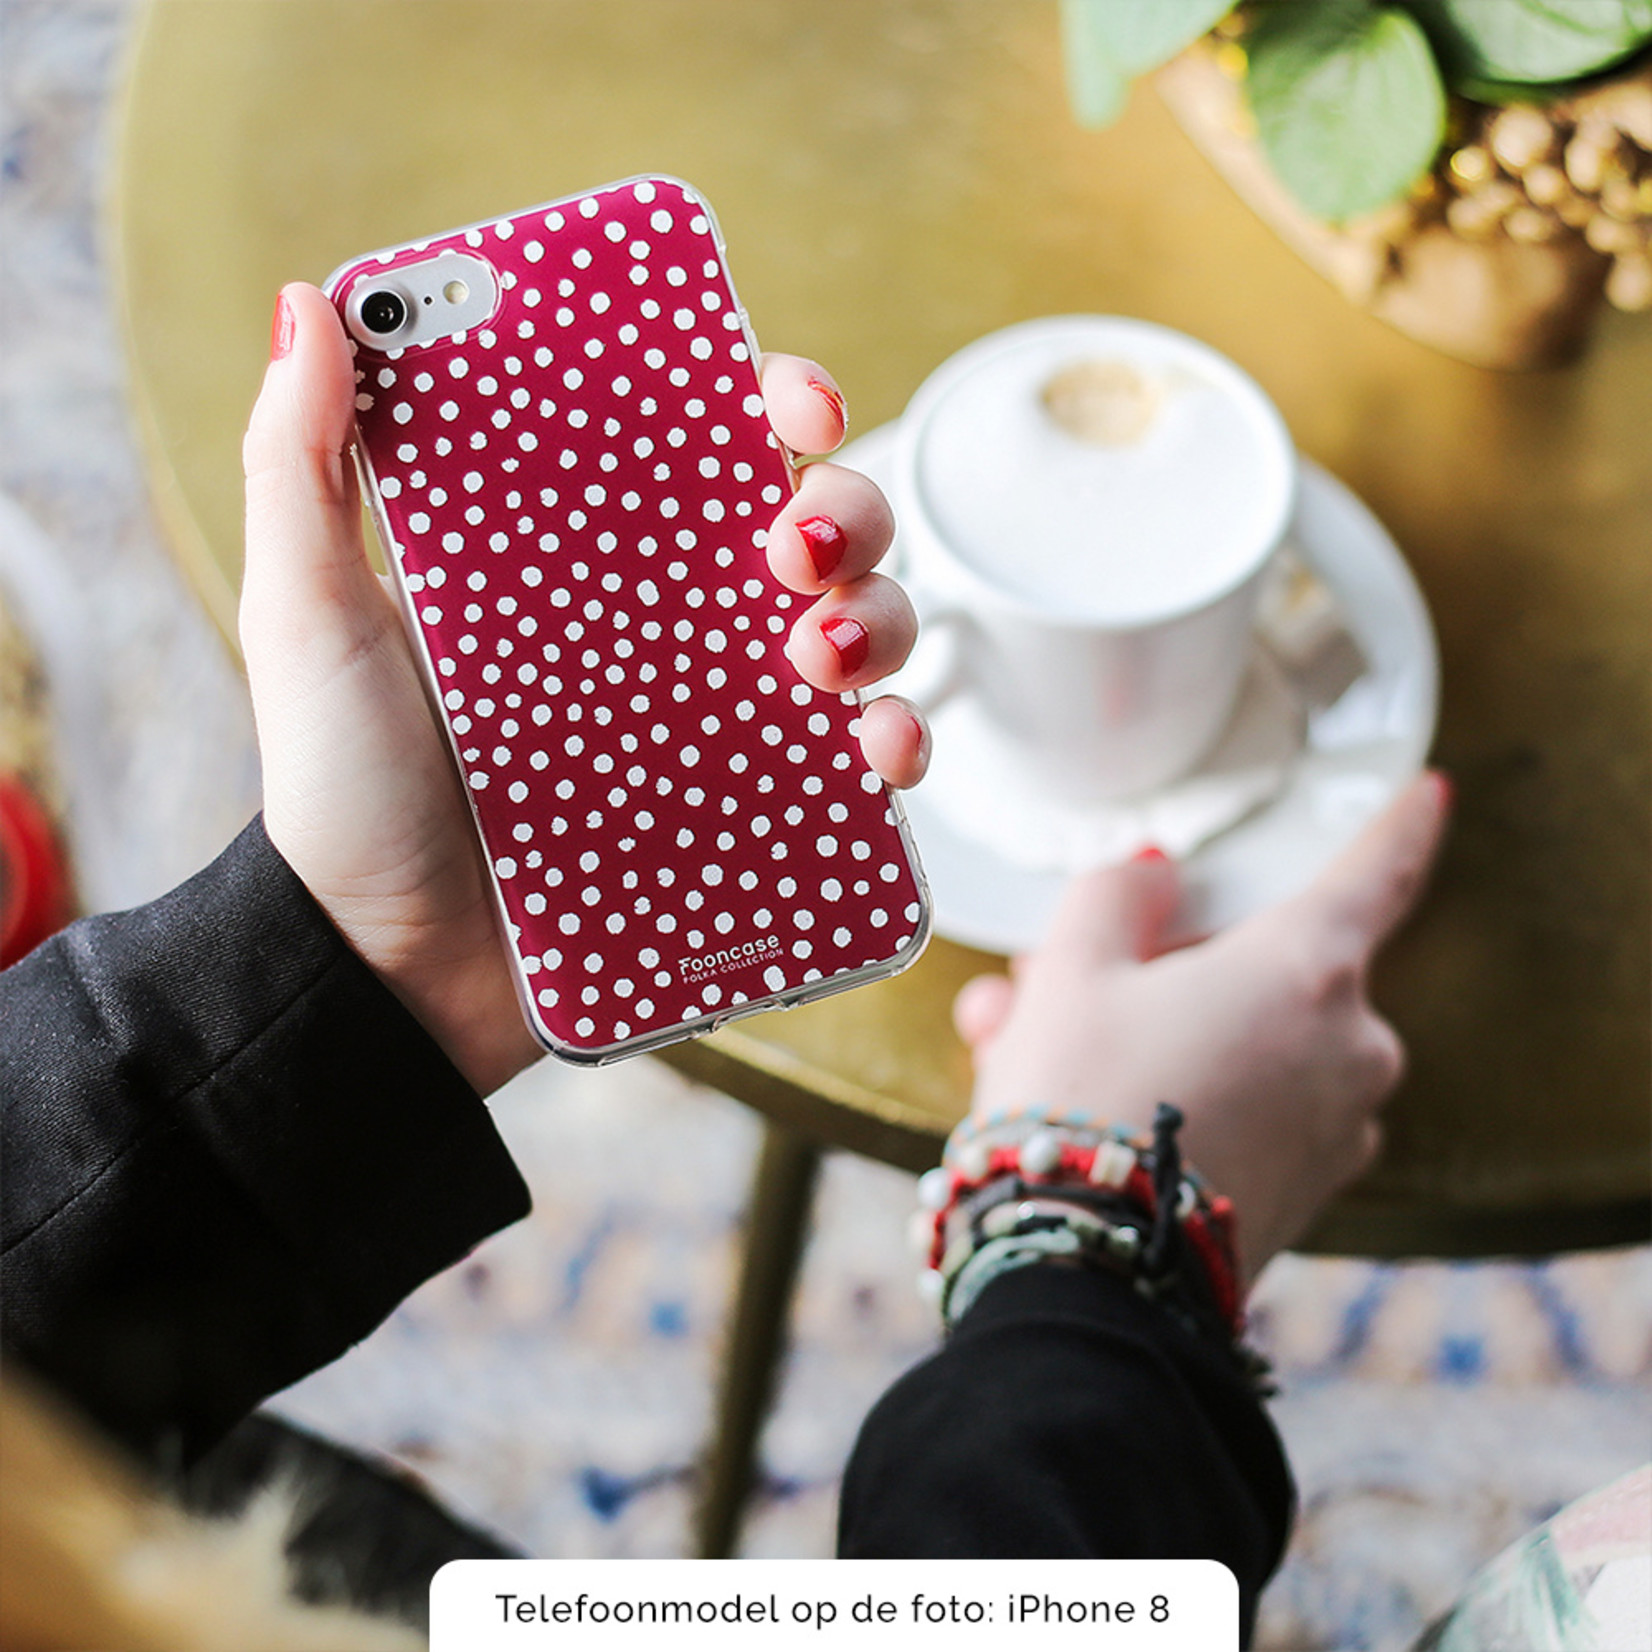 FOONCASE iPhone X hoesje TPU Soft Case - Back Cover - POLKA COLLECTION / Stipjes / Stippen / Bordeaux Rood